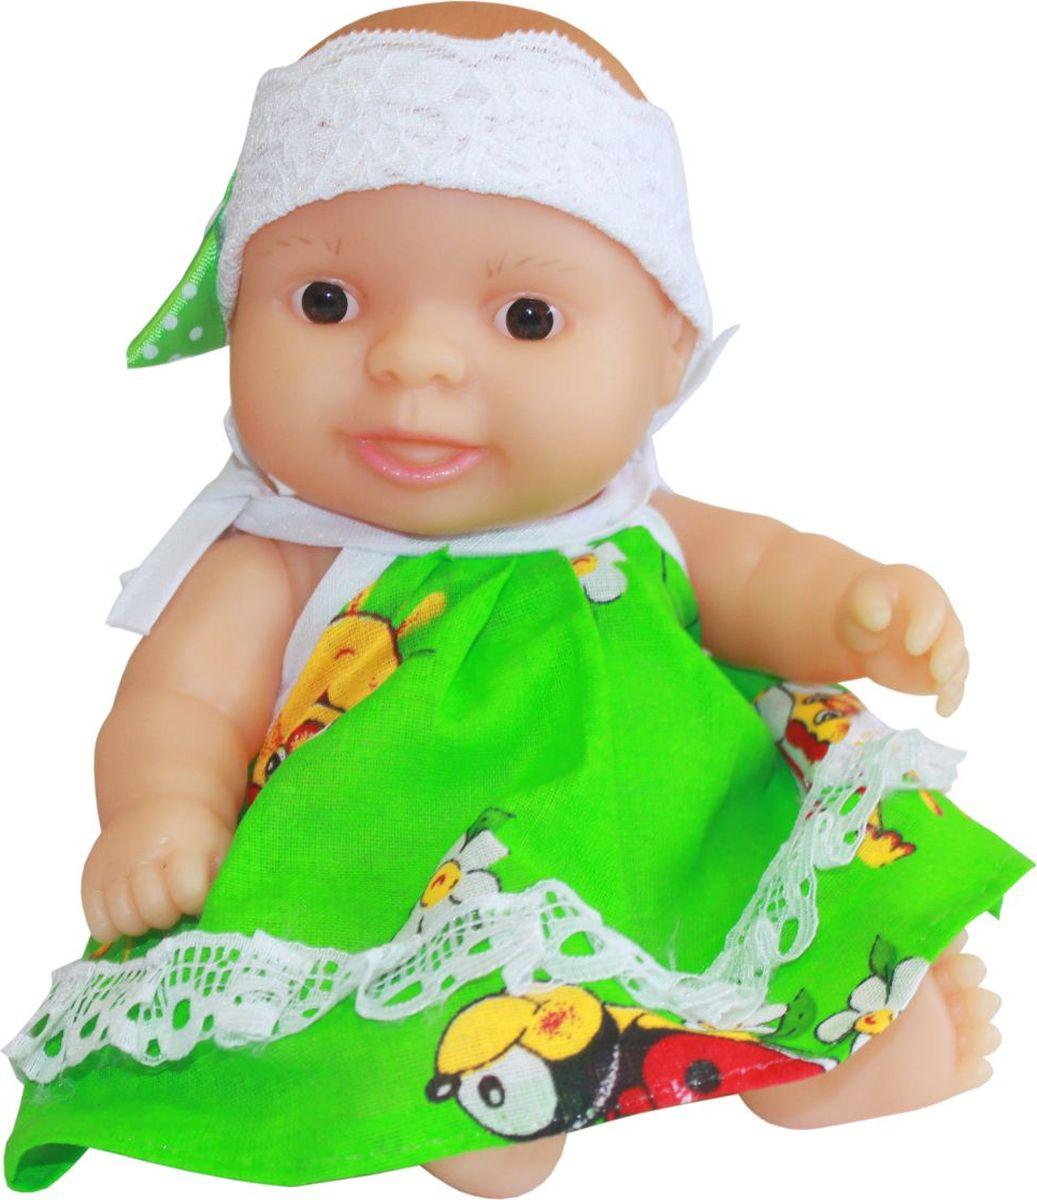 Пластмастер Пупс Агата инсити платье в пол зеленое